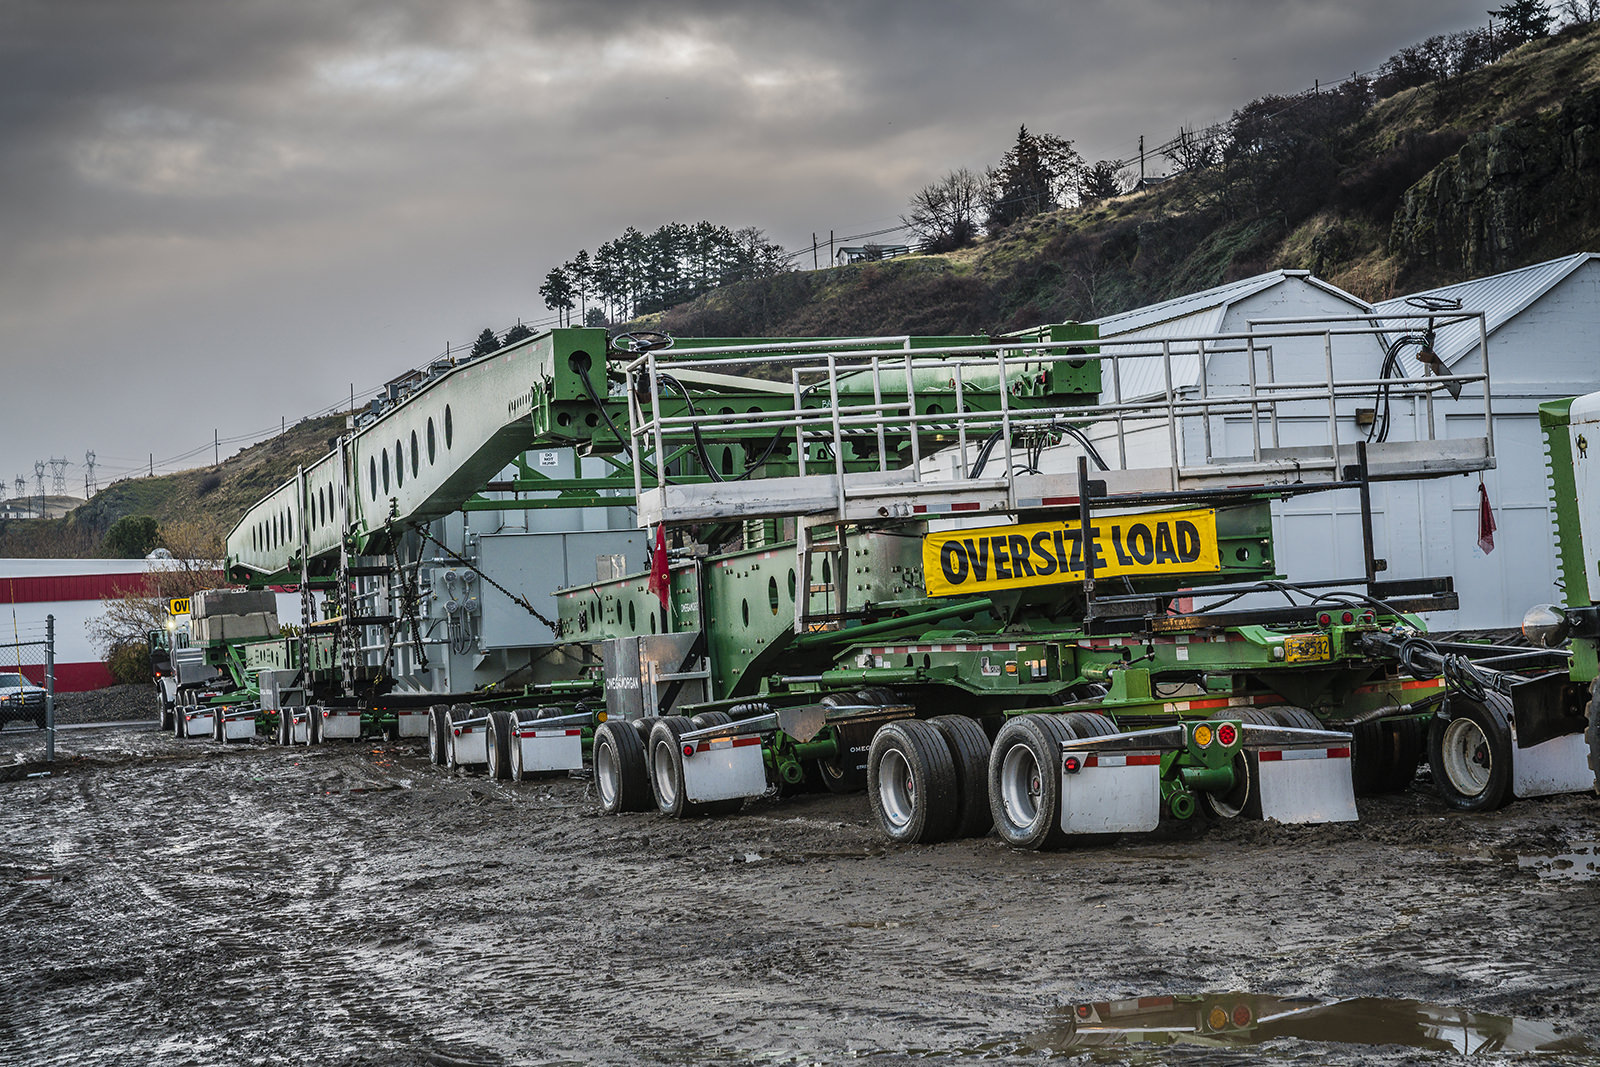 Deporting rail siding with 40,000lb transformer on high frame trailer